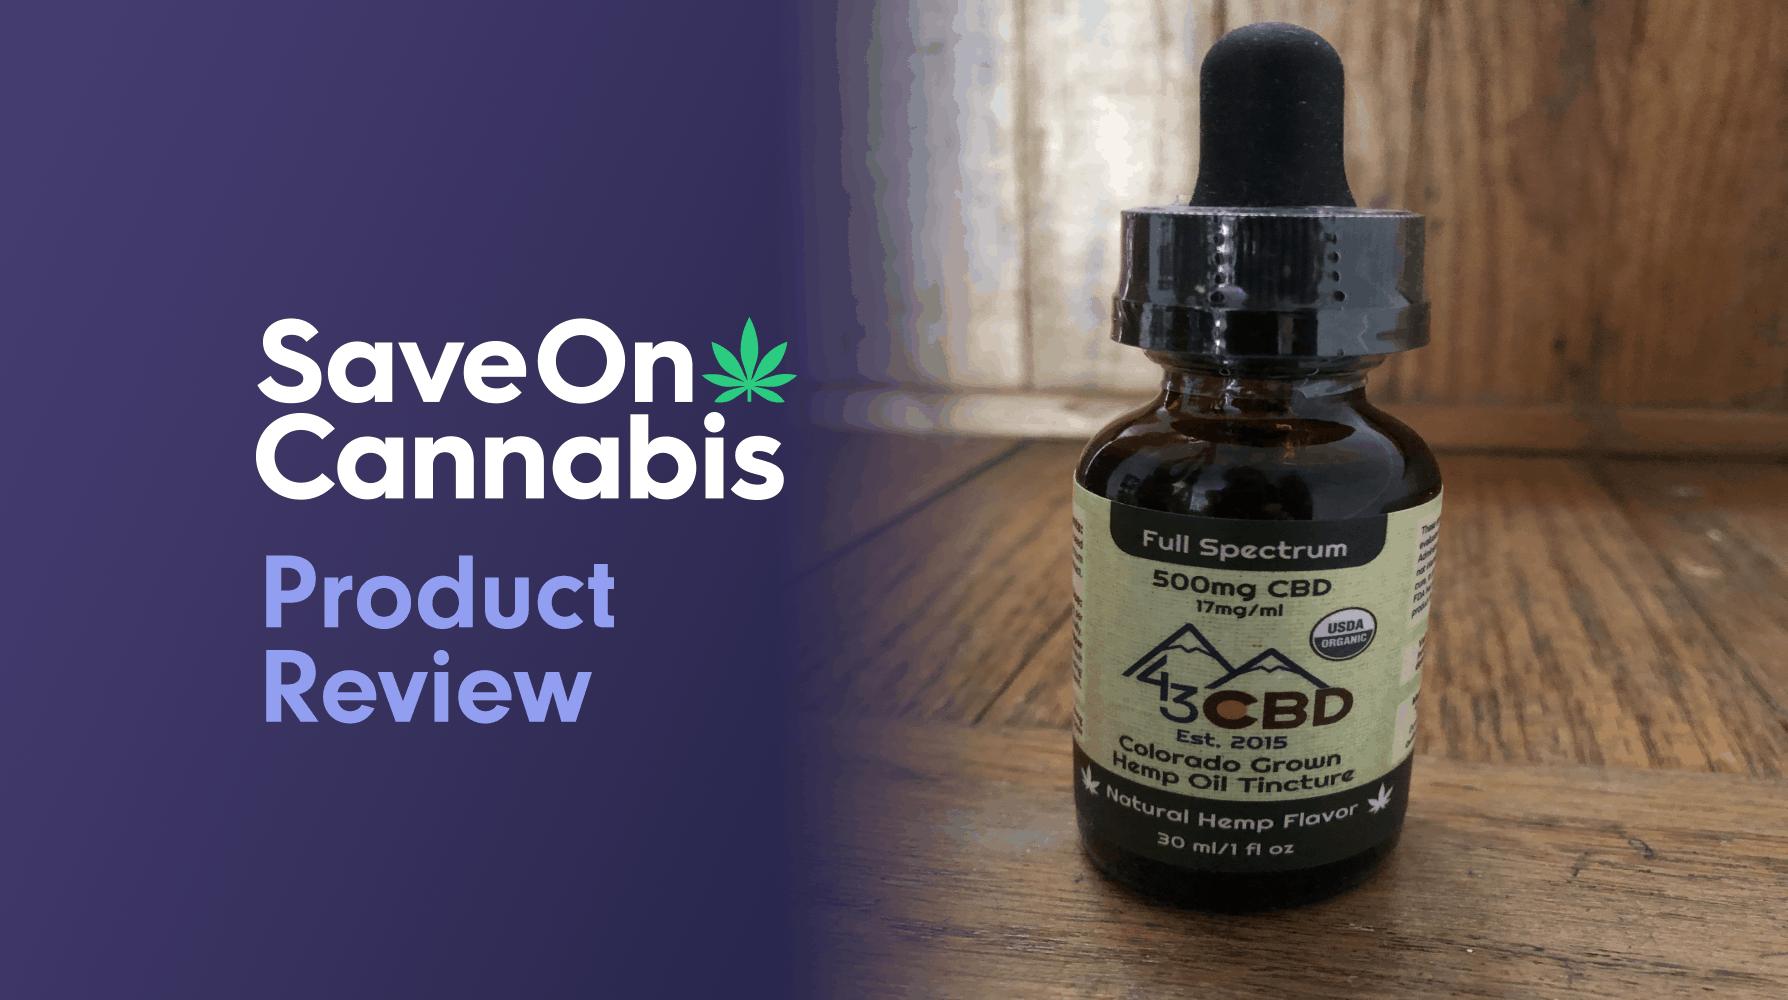 43 CBD USDA Organic Full Spectrum CBD Oil 500mg Natural Save On Cannabis Review Website